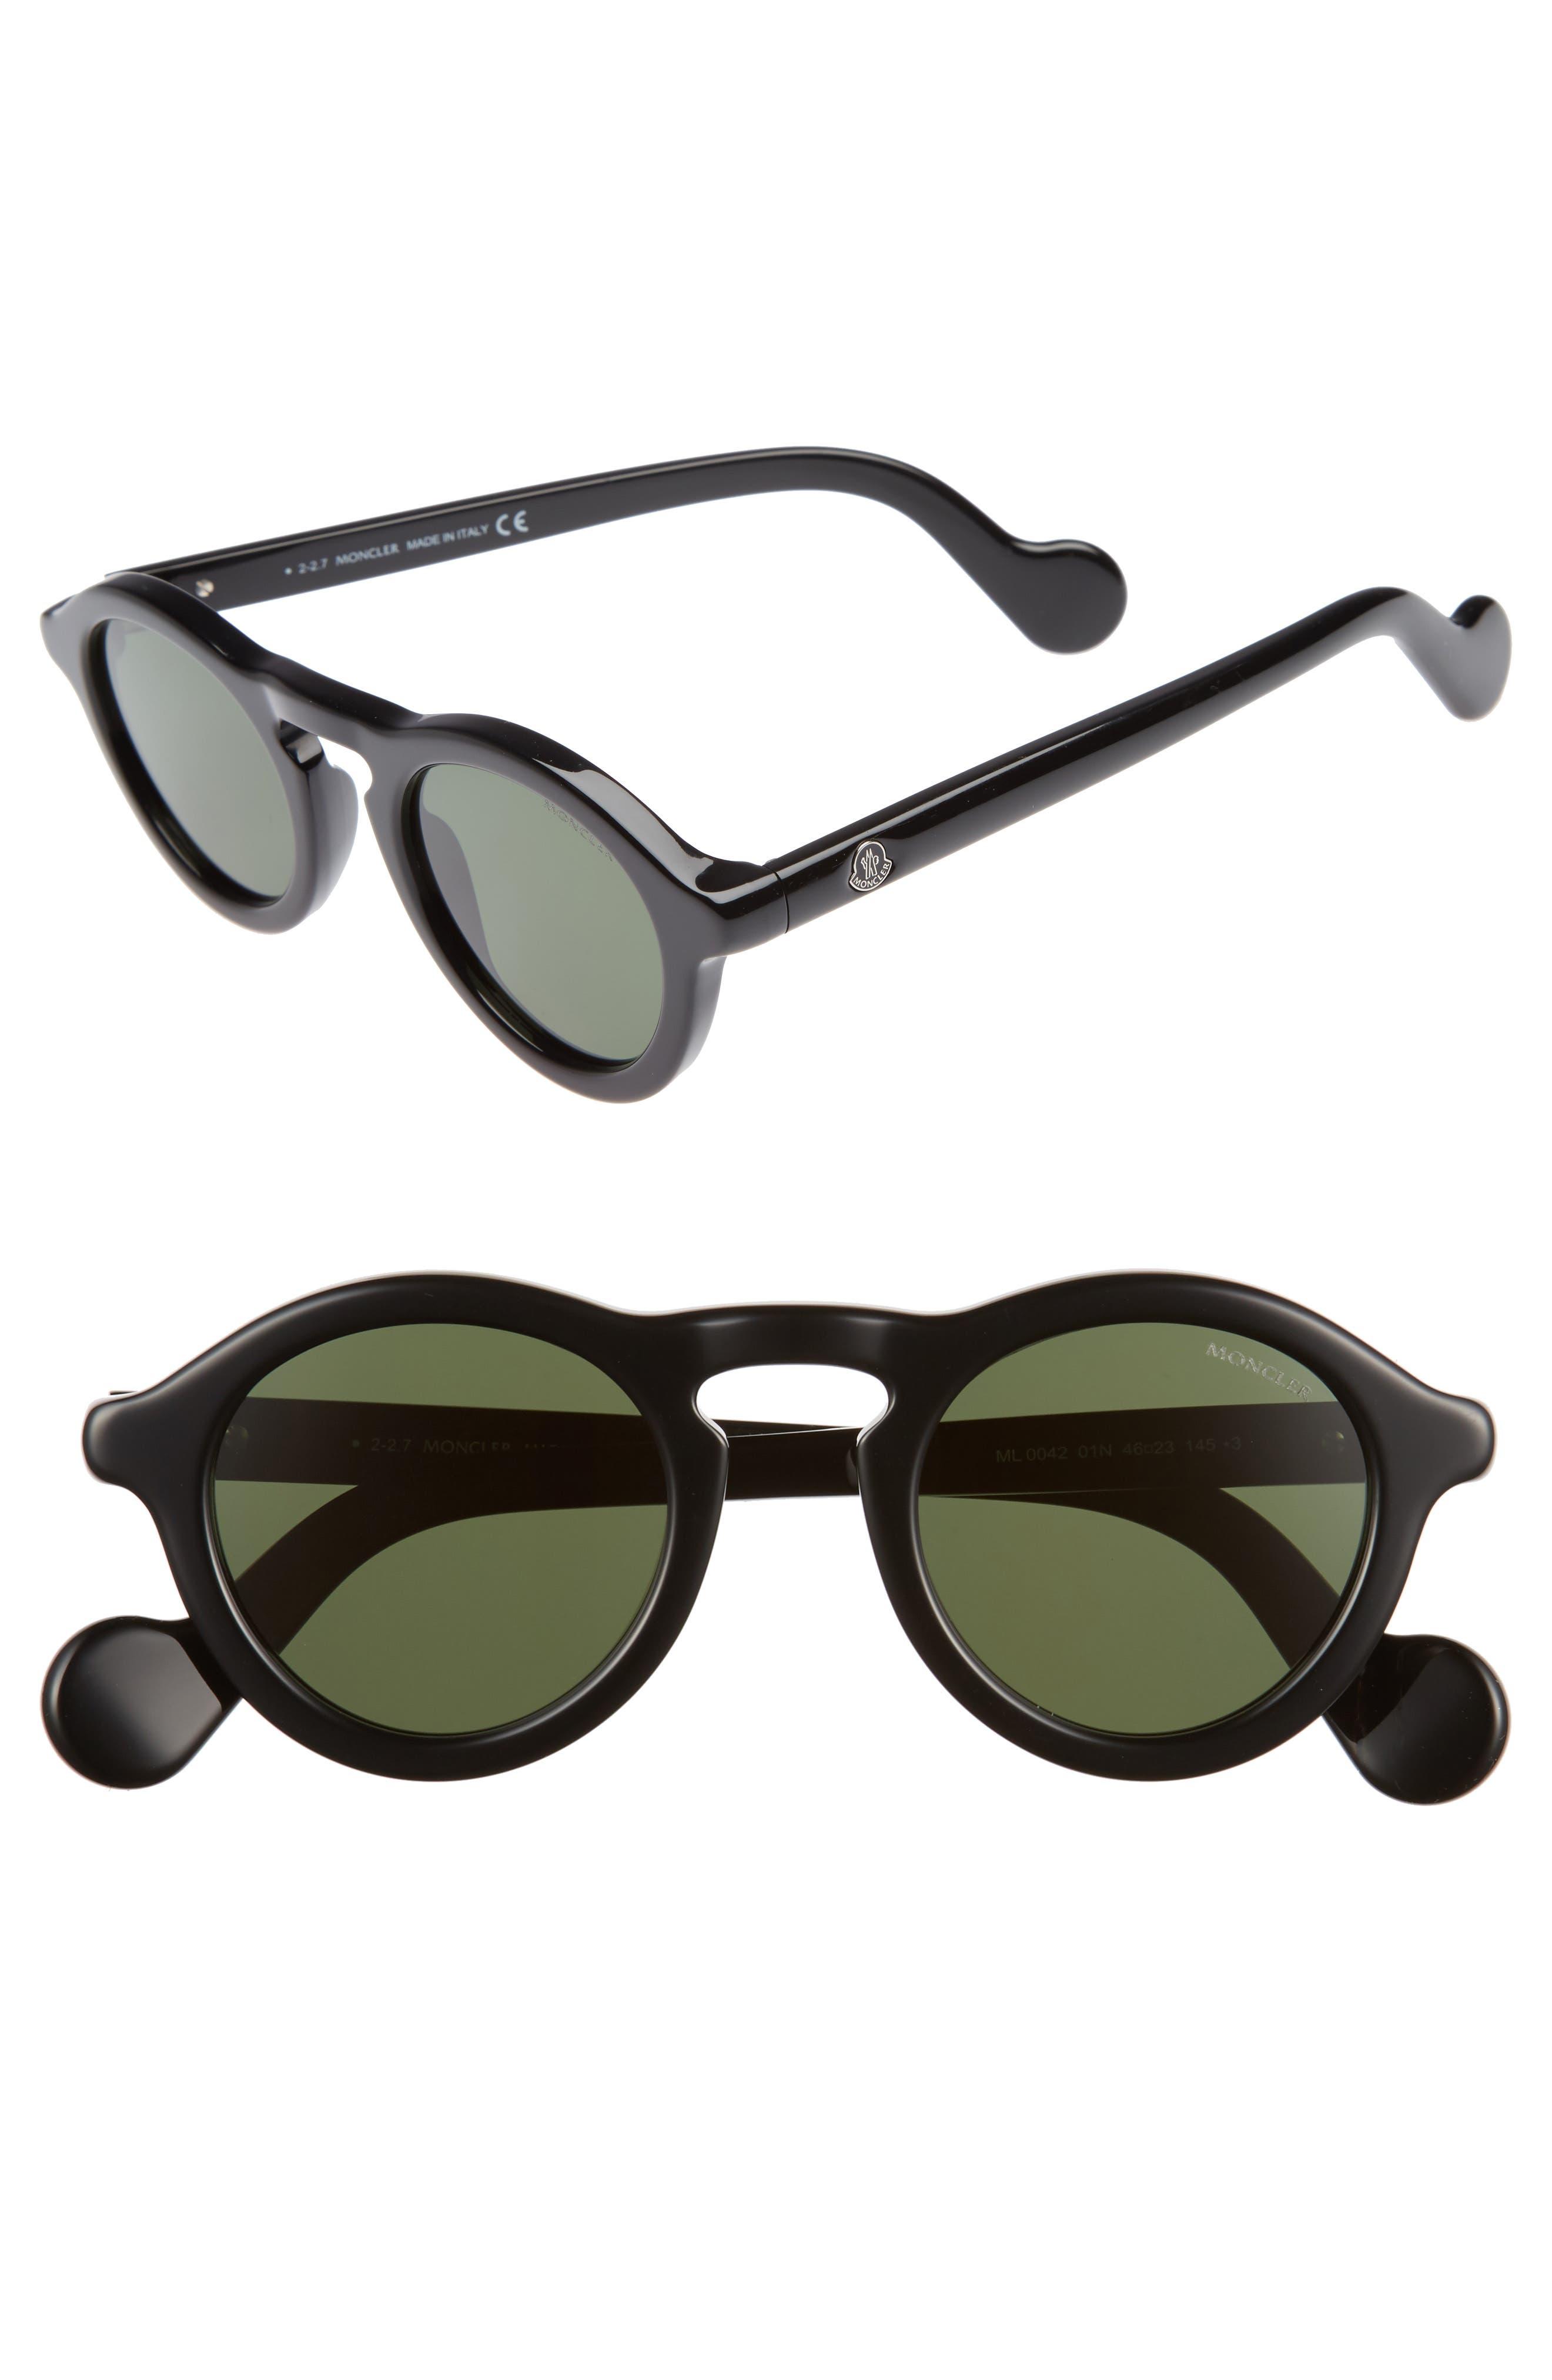 46mm Round Sunglasses,                             Main thumbnail 1, color,                             BLACK/ VINTAGE GREEN